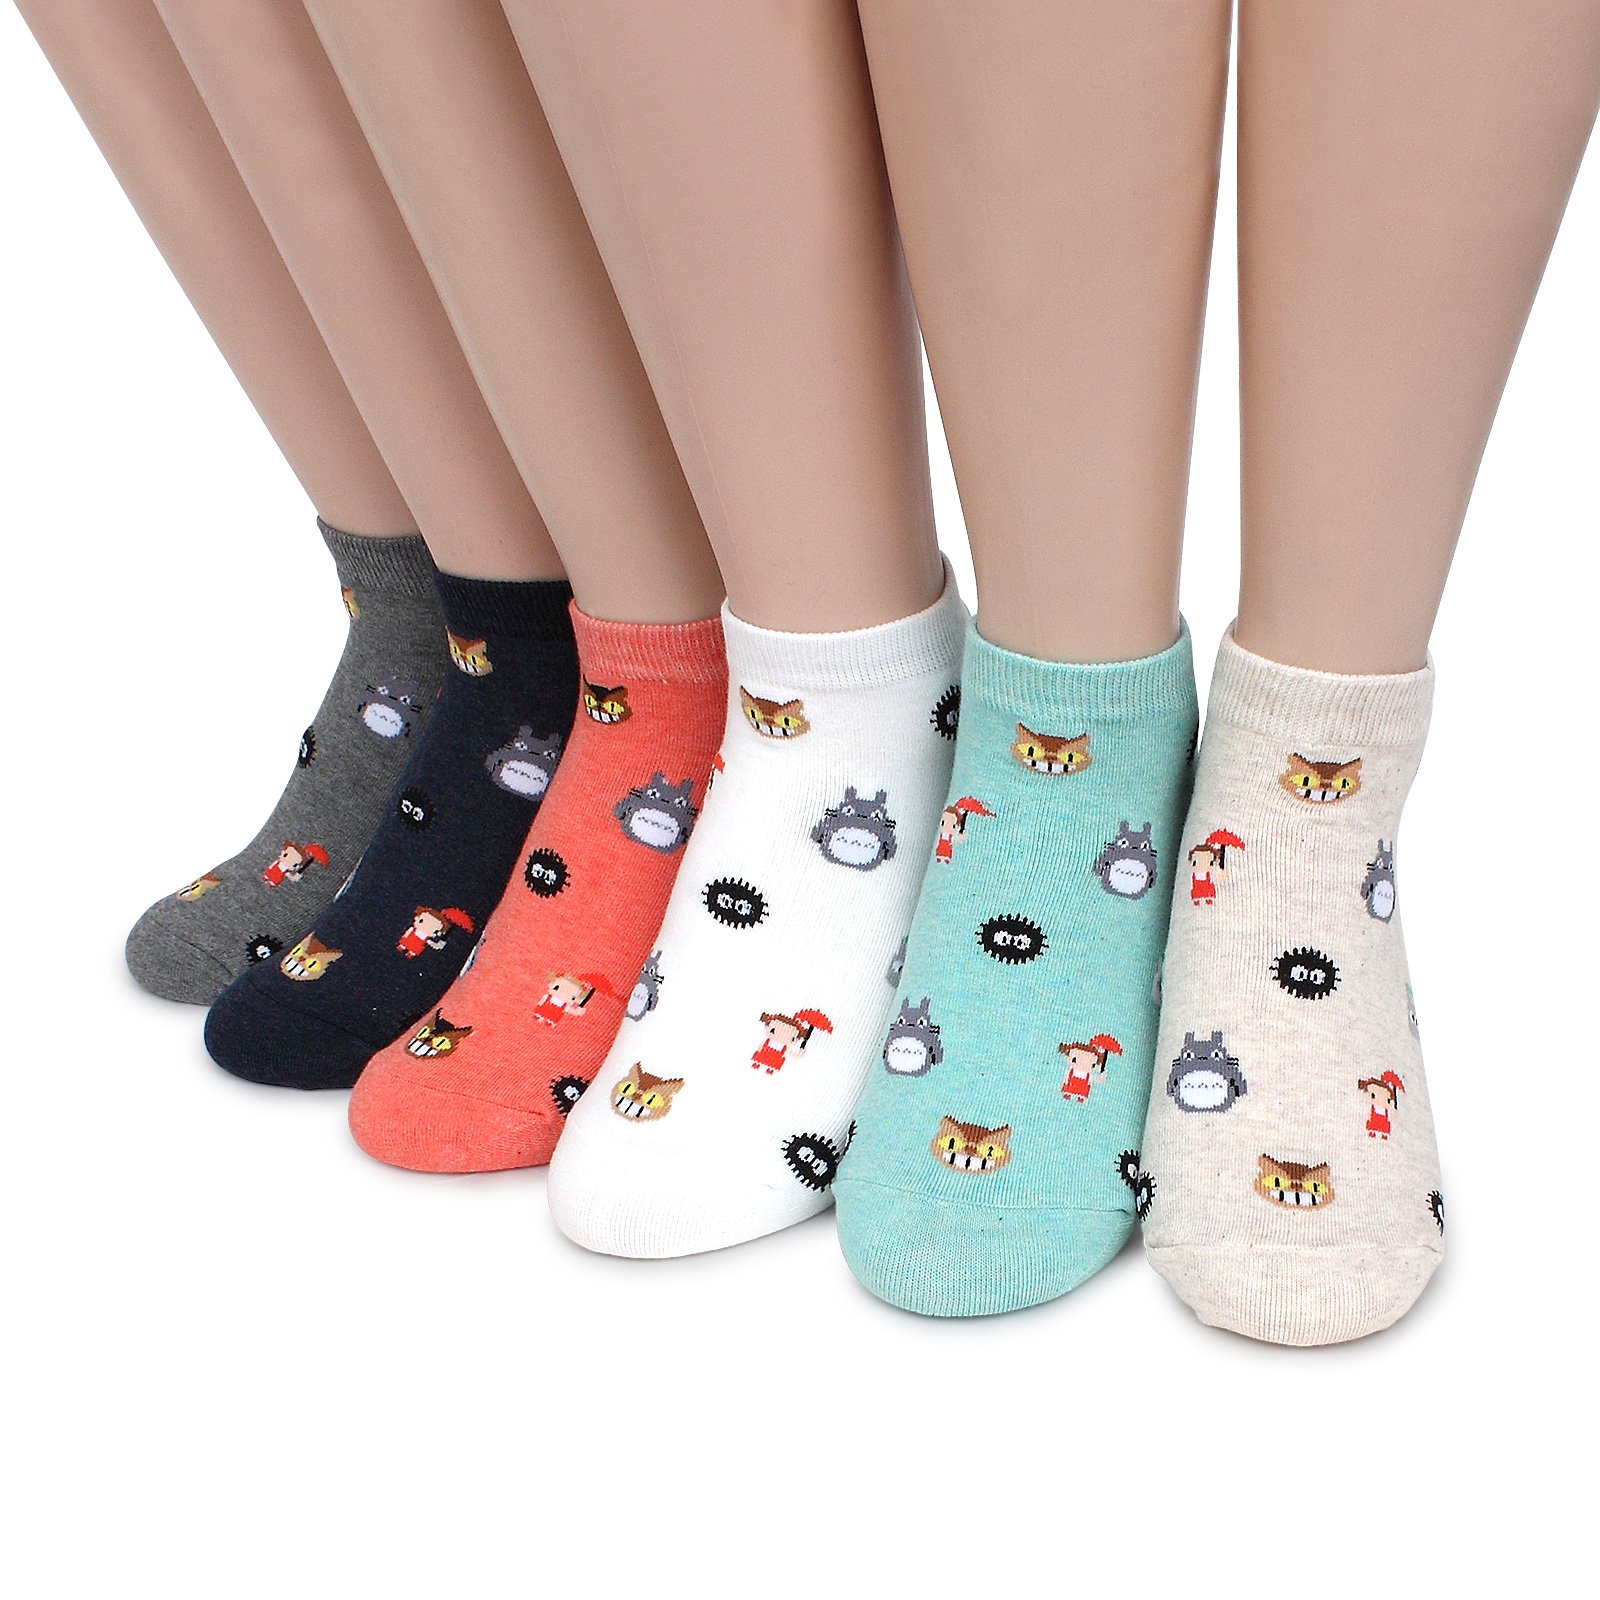 Intype Japaness Character Miyazaki Totoro Socks Collection (Low cut 6pairs (JD))